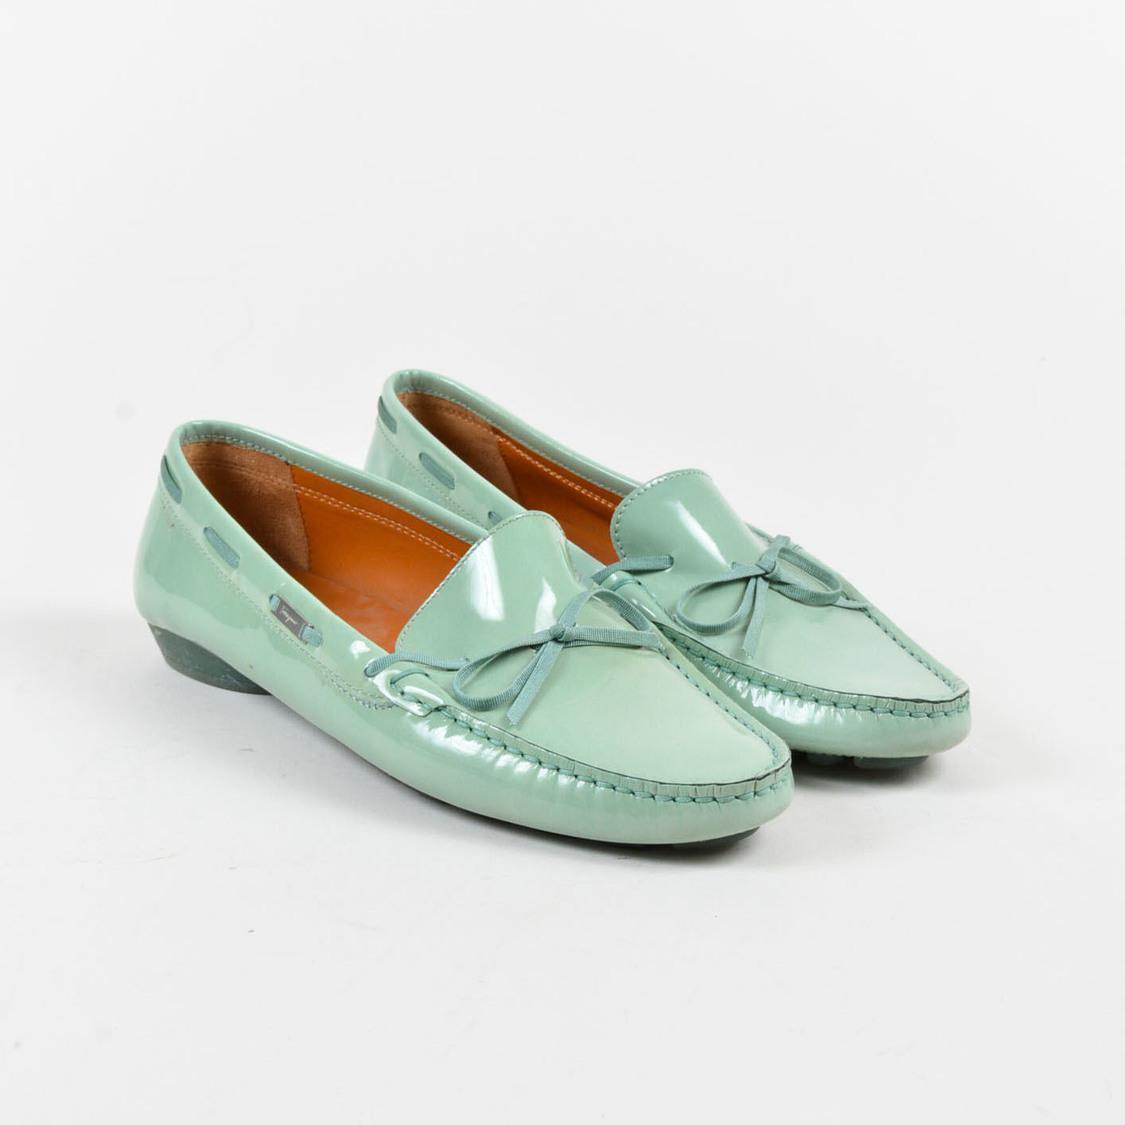 82309c97e339 Ferragamo Two Tone Green Patent Leather Loafers in Green - Lyst